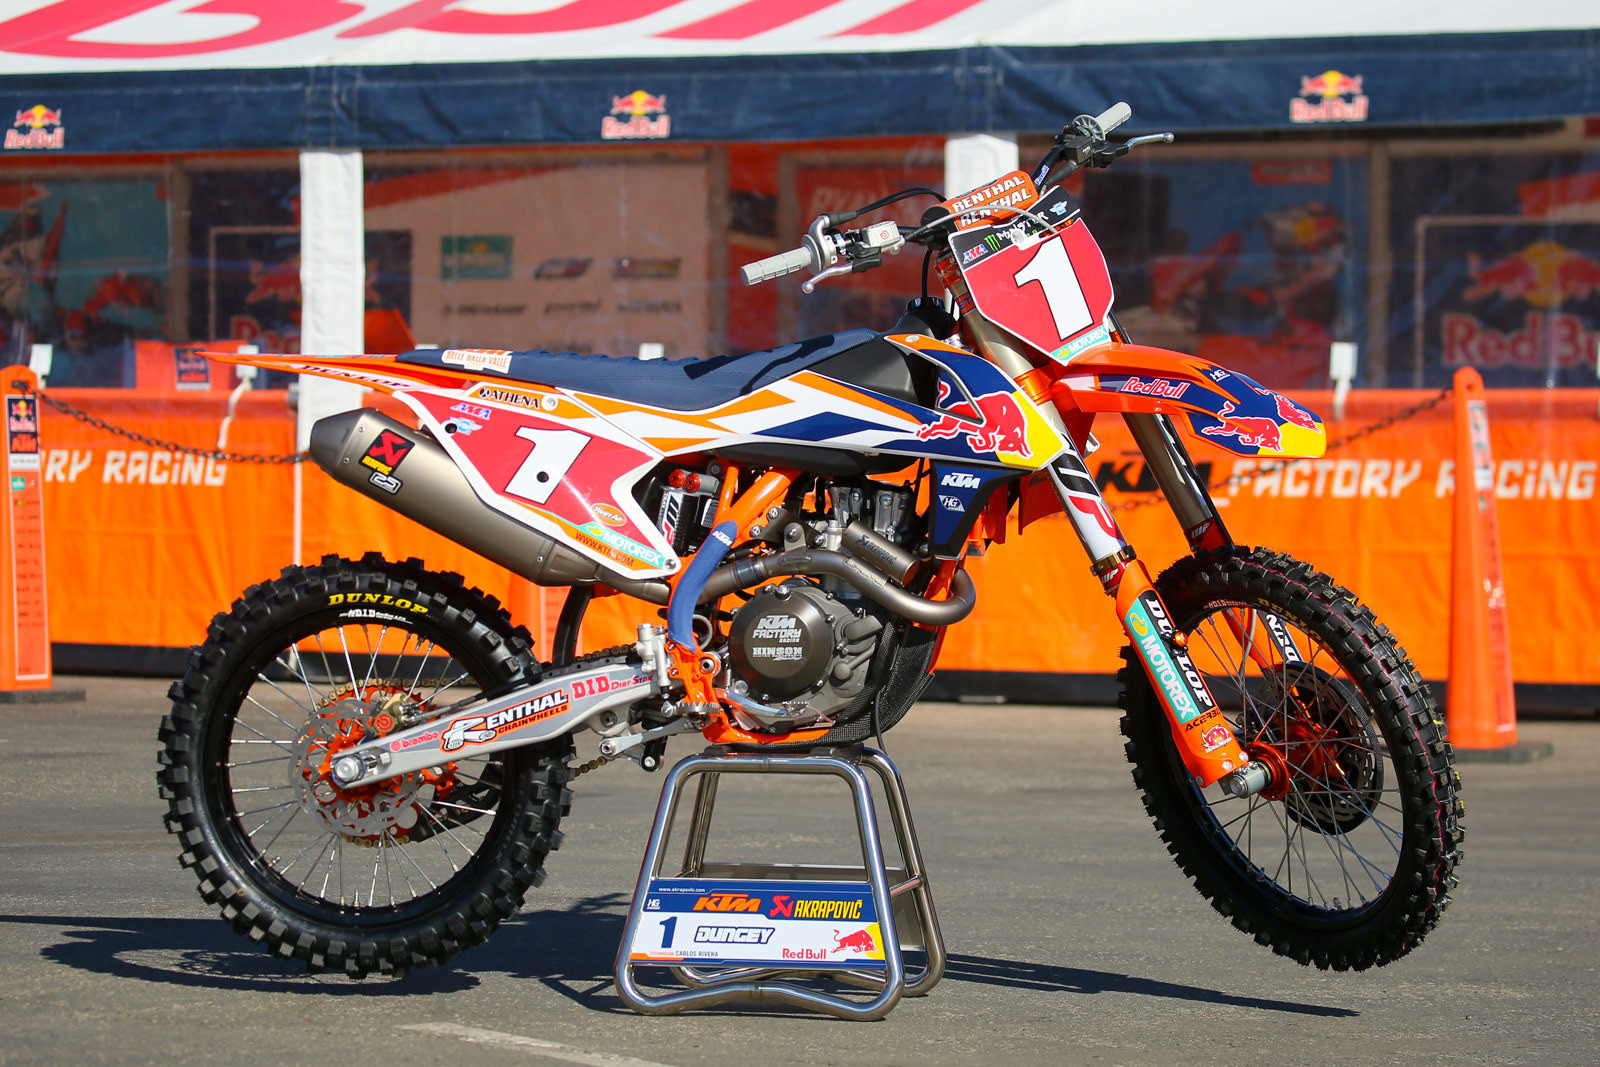 Ryan Dungey - 2016 Bikes of Supercross - Motocross Pictures - Vital MX